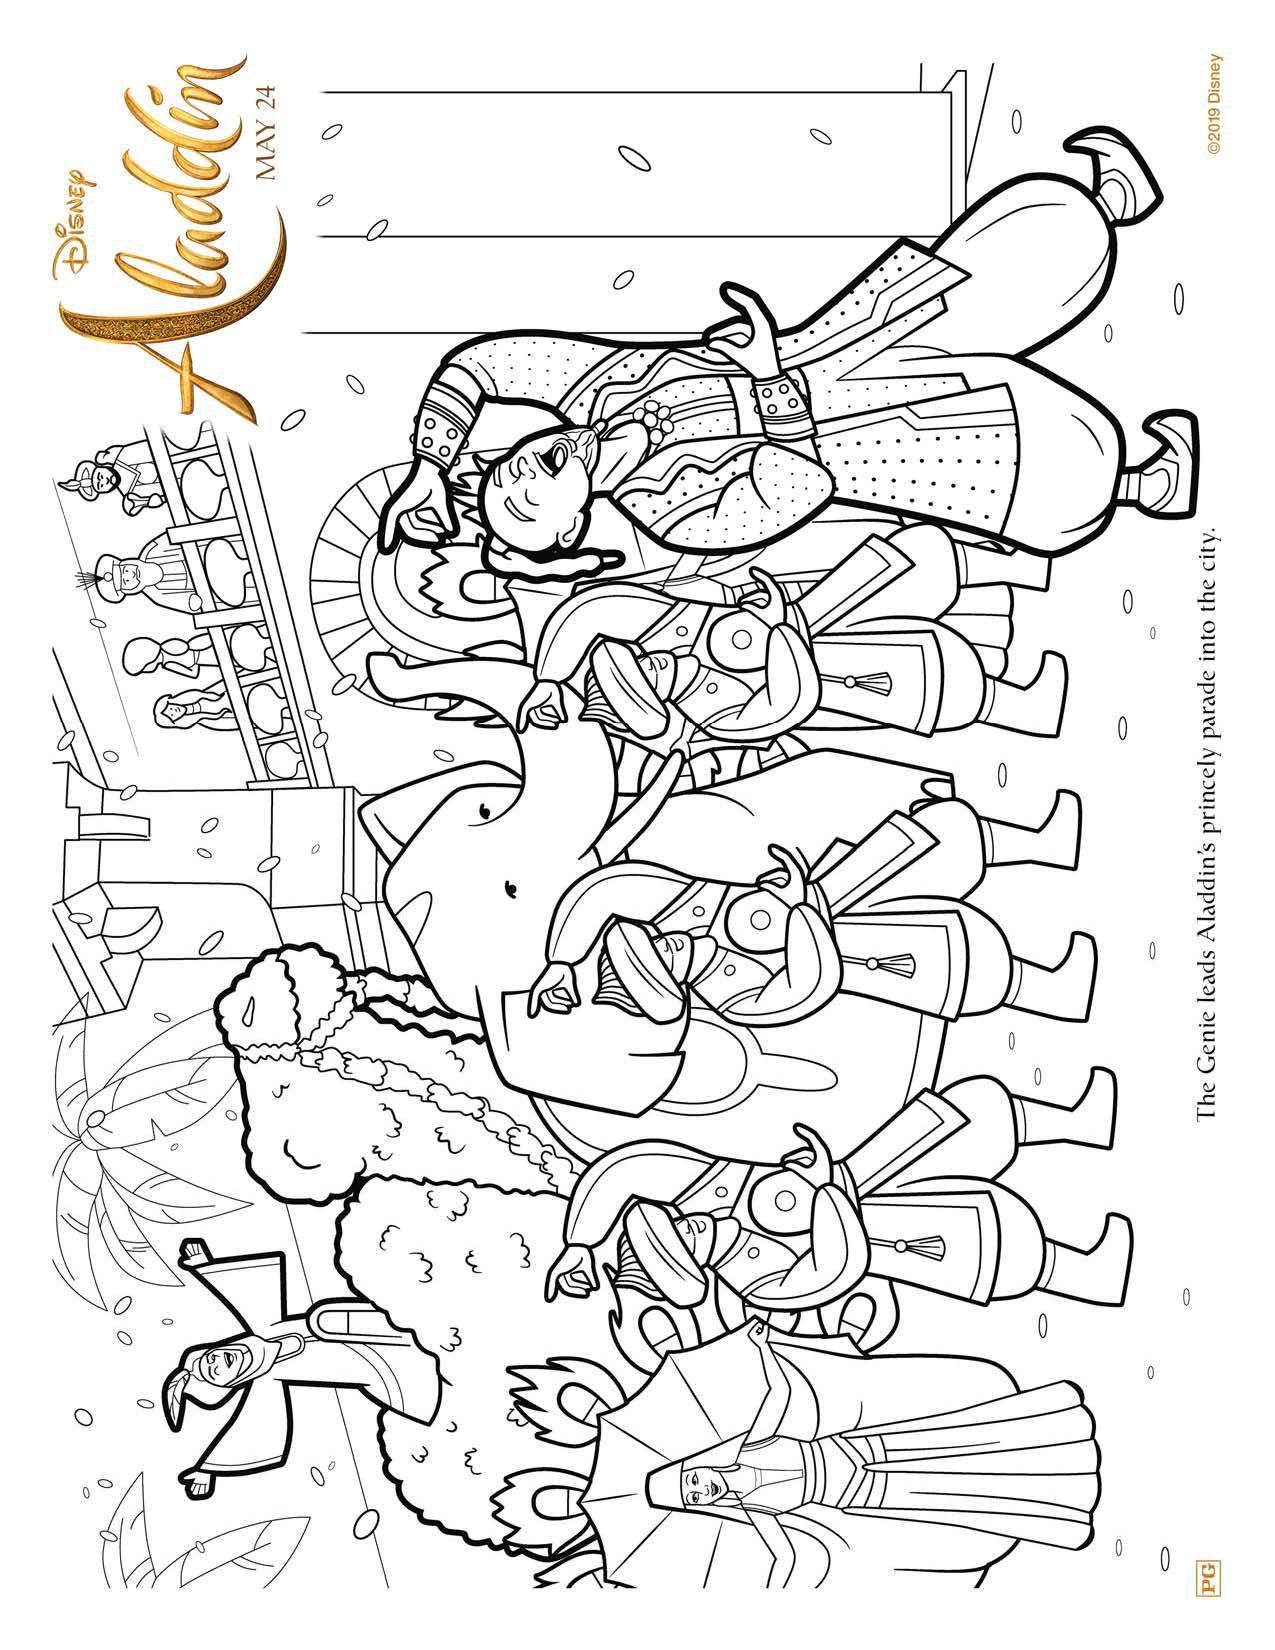 Aladdin 2019 Coloring Pages | Coloring Aladdin, Abu, Jasmine ... | 1650x1275